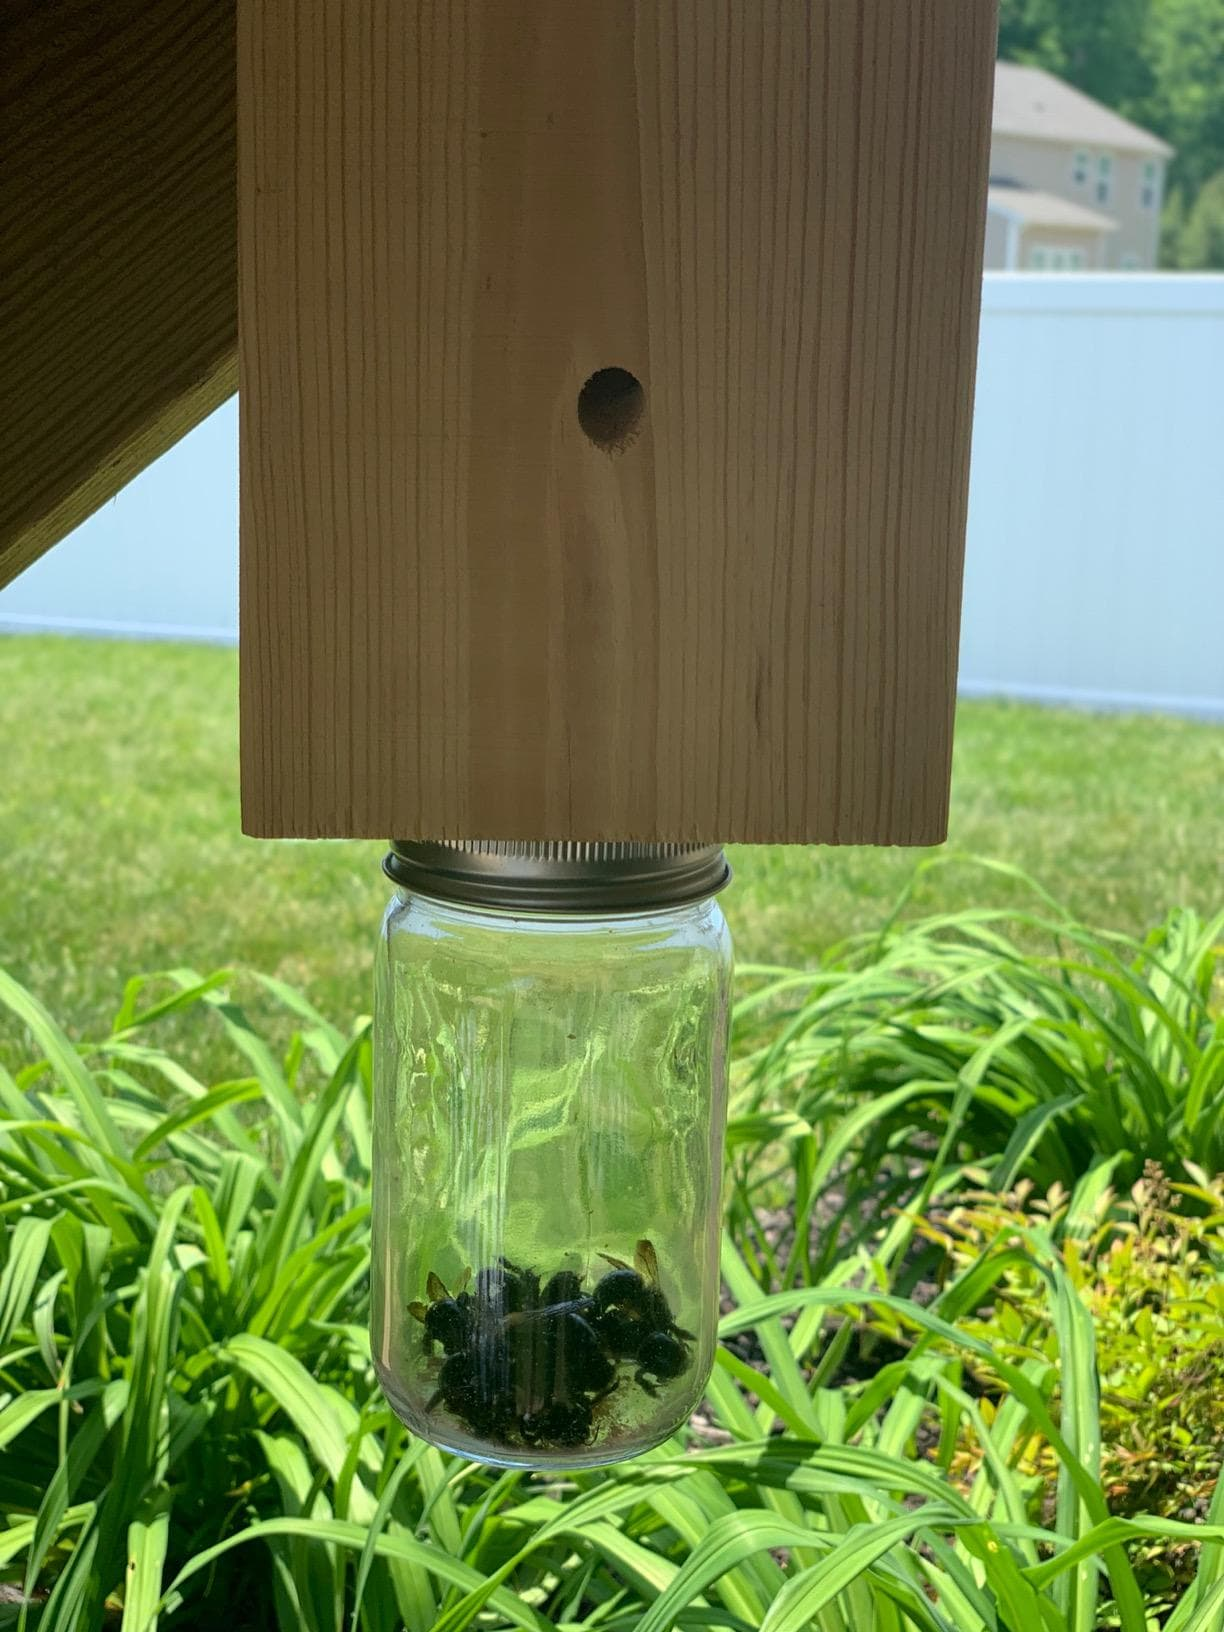 cbs carpenter bee trap image